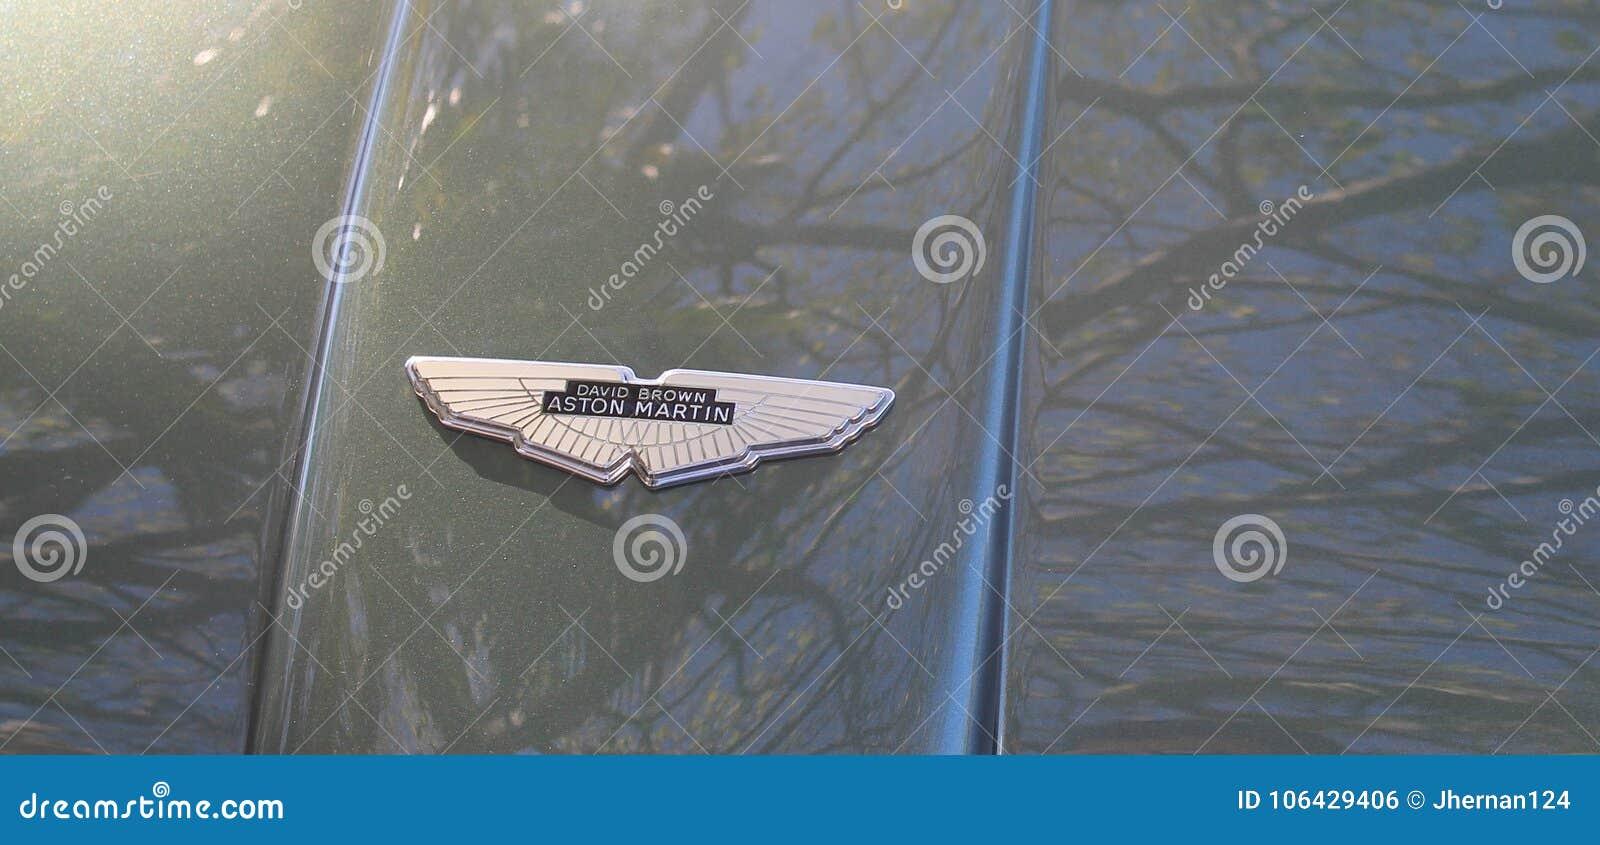 Aston Martin Rapide Front Detail Editorial Photo Image Of Grey - Palm beach aston martin